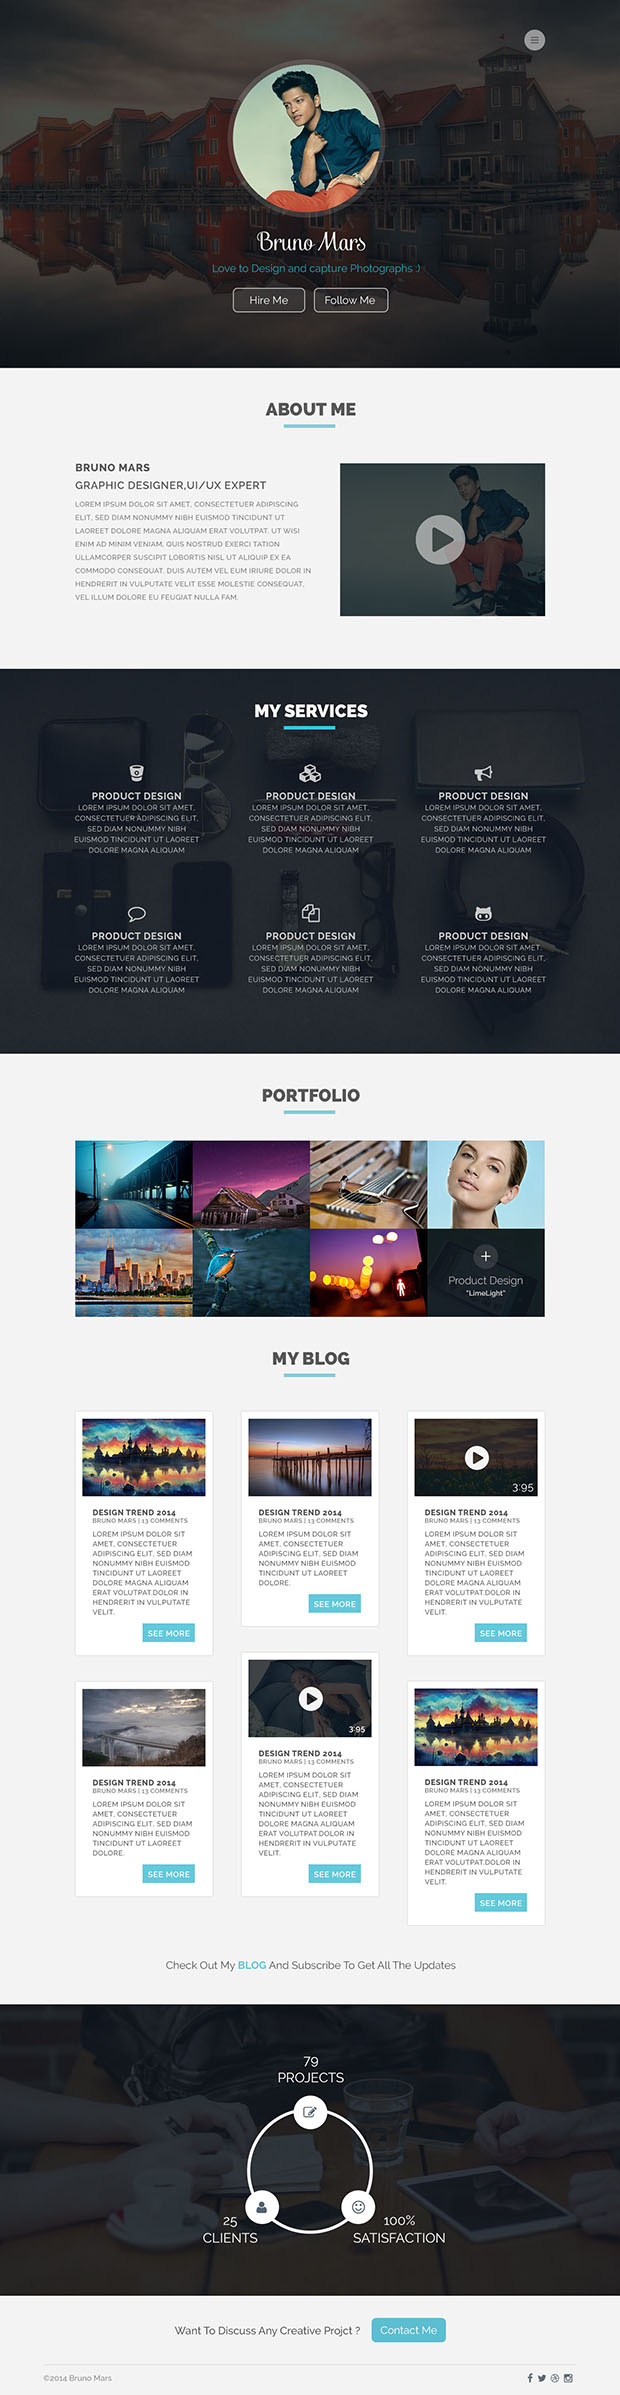 Portfolio-site-Freebie